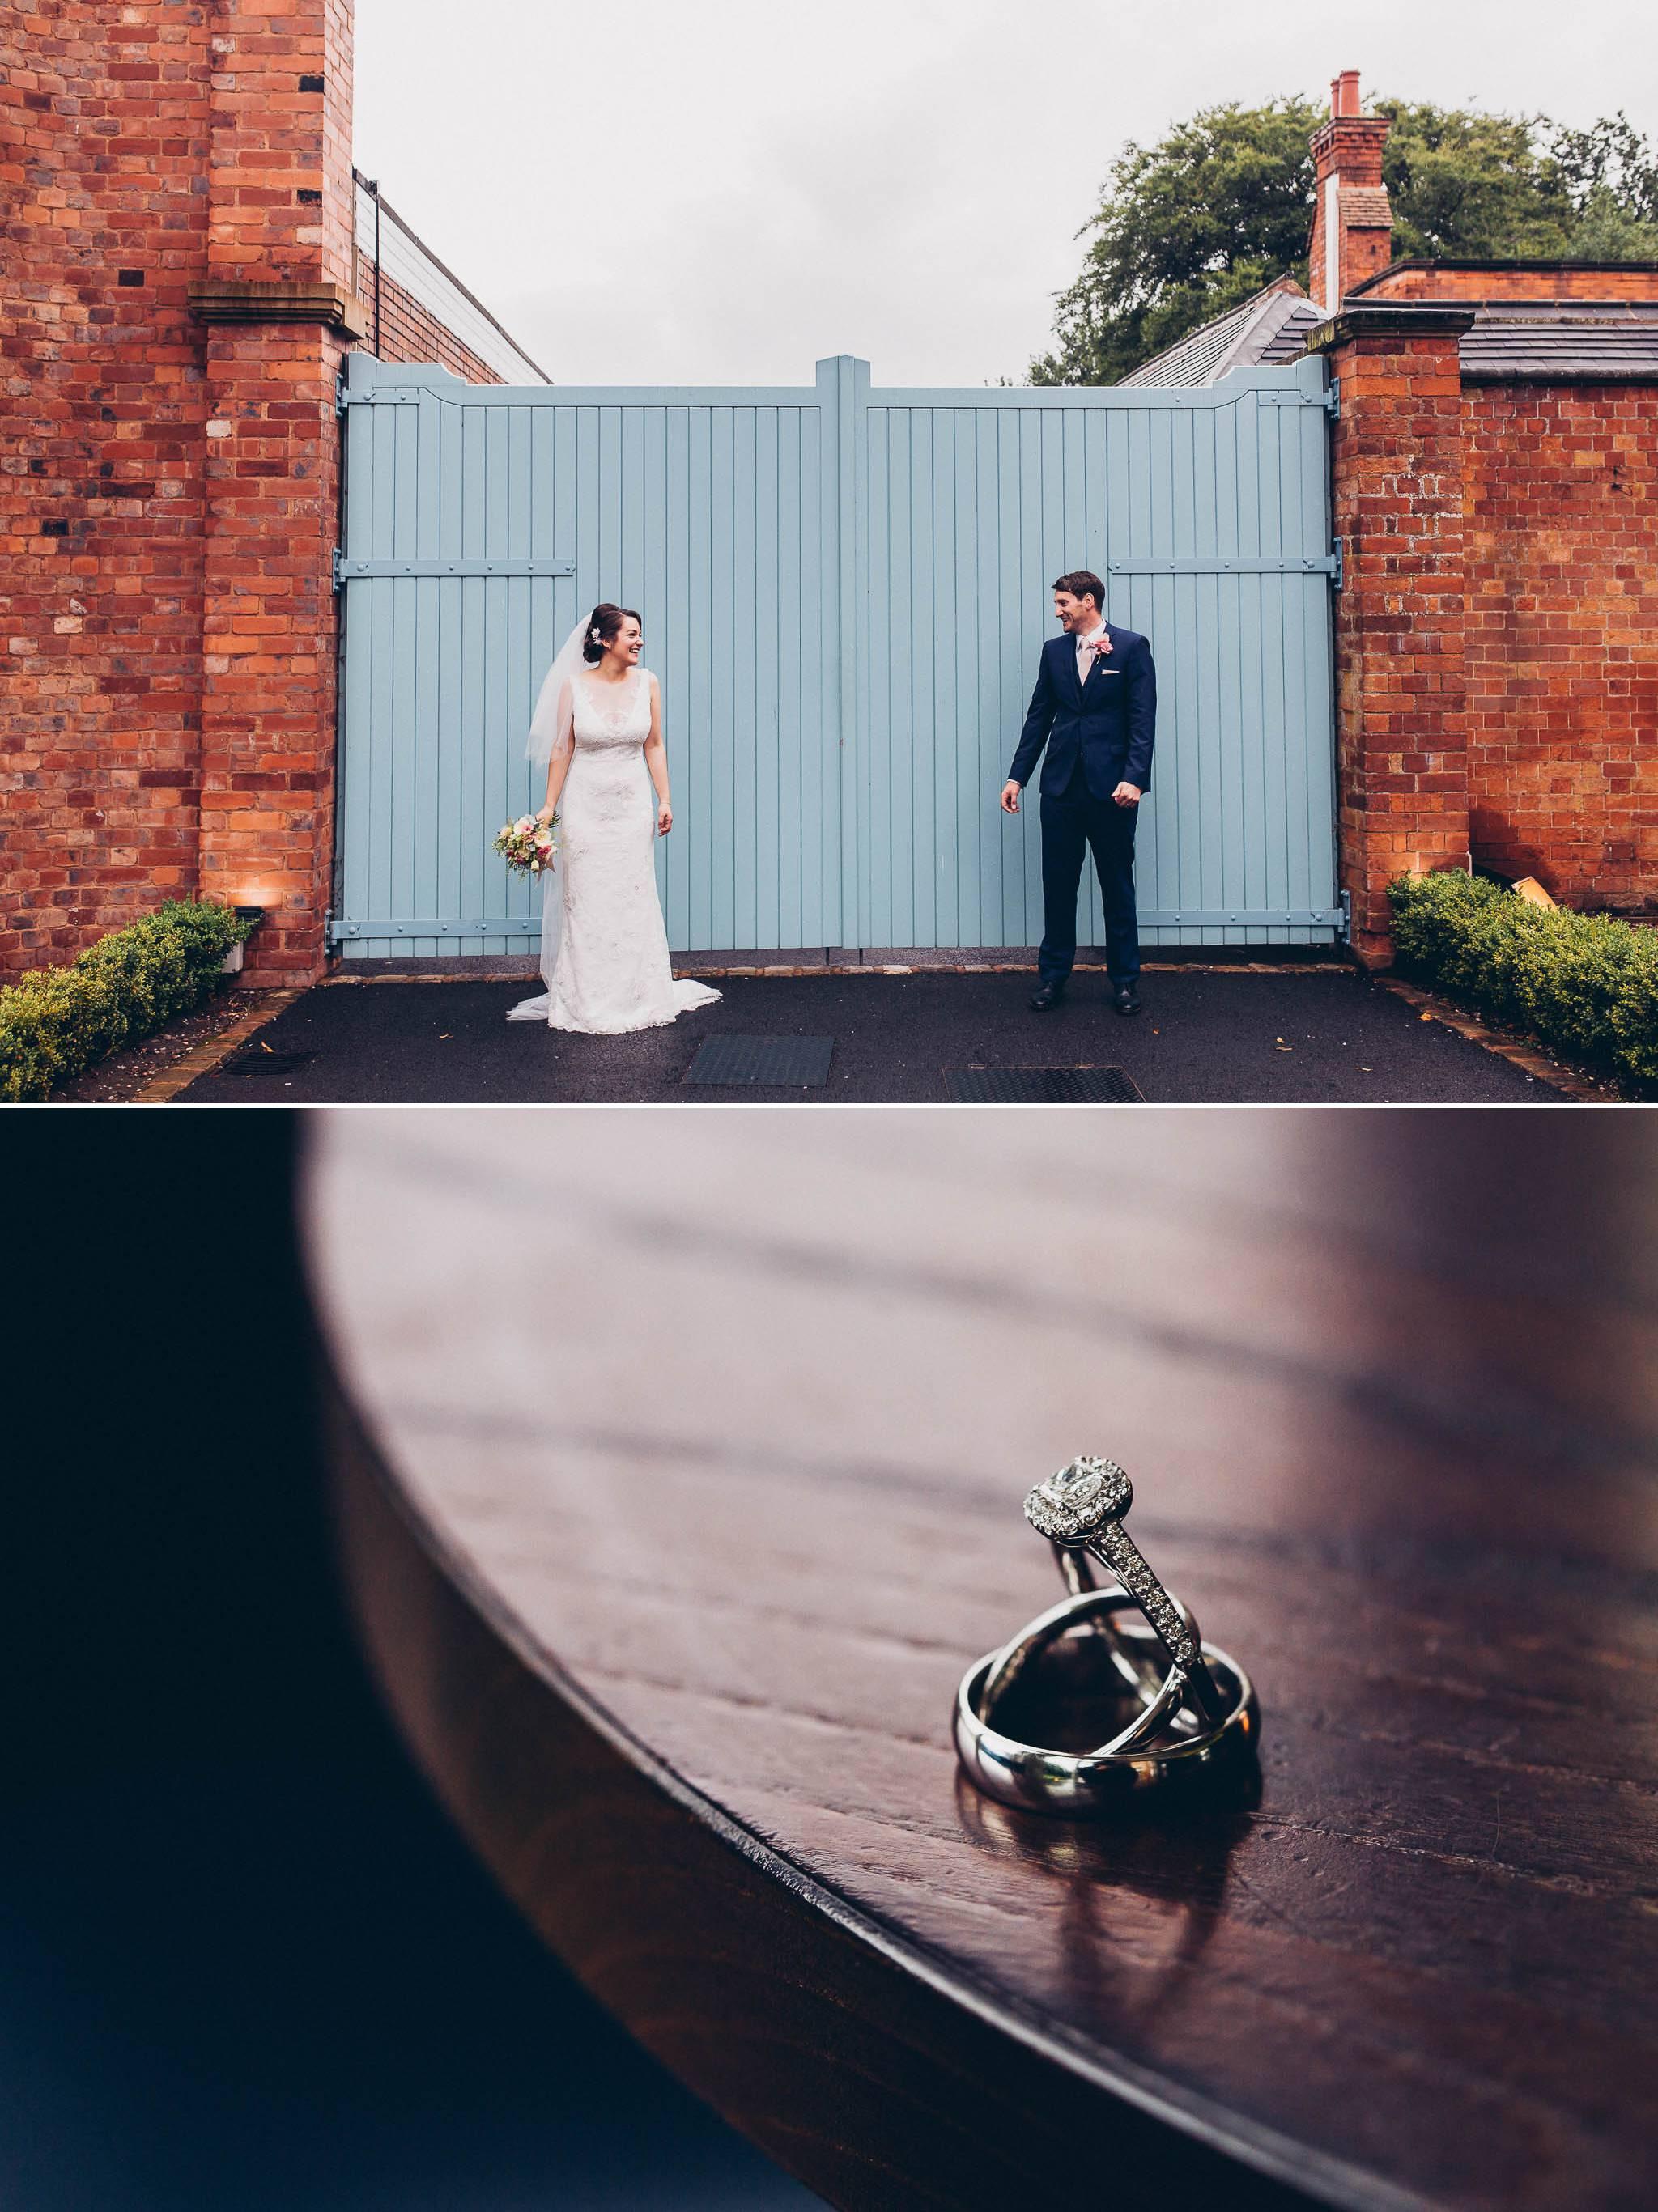 pendrell-hall-wedding-photography 16.jpg